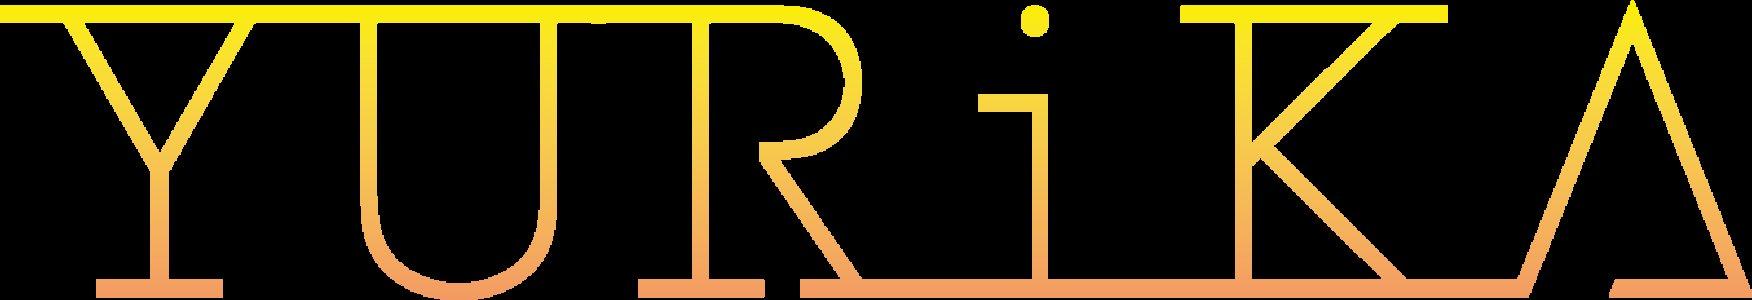 TVアニメ「BEASTARS」エンディングテーマ発売記念イベント アニメイト秋葉原本館 夜の部 ミニライブ&私物サイン会